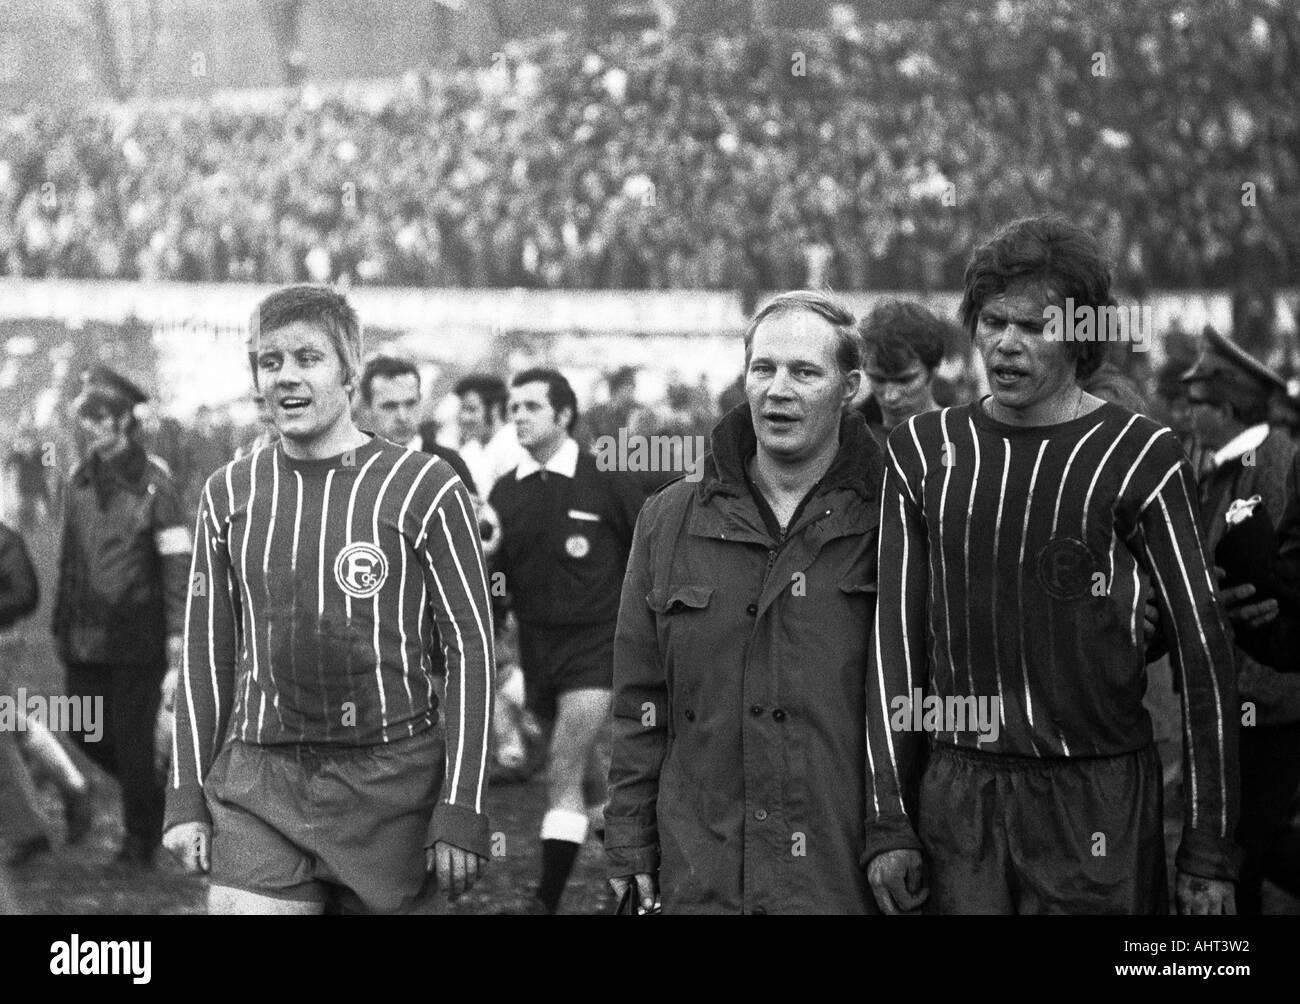 football, Regionalliga West, 1970/1971, Stadium am Zoo in Wuppertal, Wuppertaler SV versus Fortuna Duesseldorf 1:1, football players leaving the pitch, f.l.t.r. Werner Lungwitz (Ddorf), referee Gerd Hennig from Duisburg, masseur Claus Henselmann (Ddorf), - Stock Image